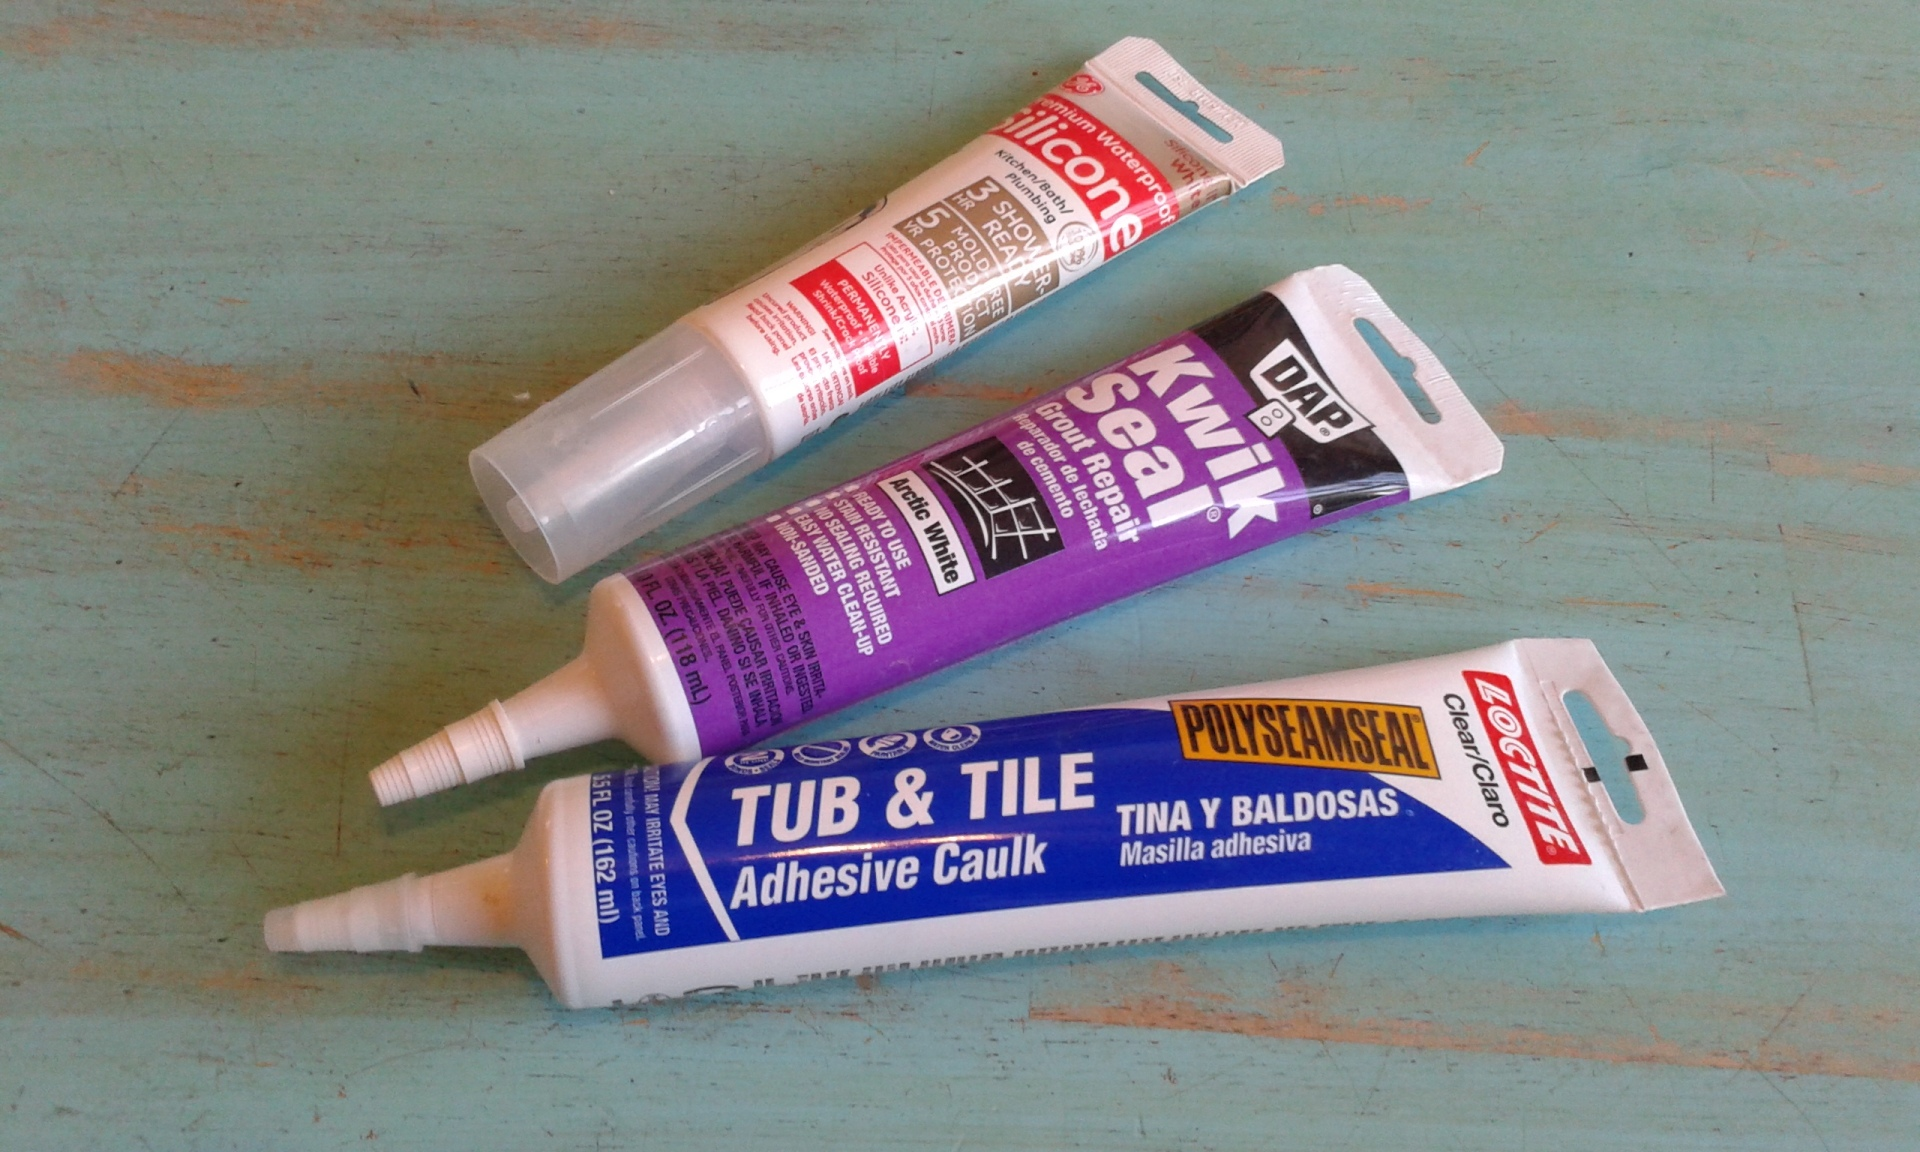 tubes of tub and tile caulk